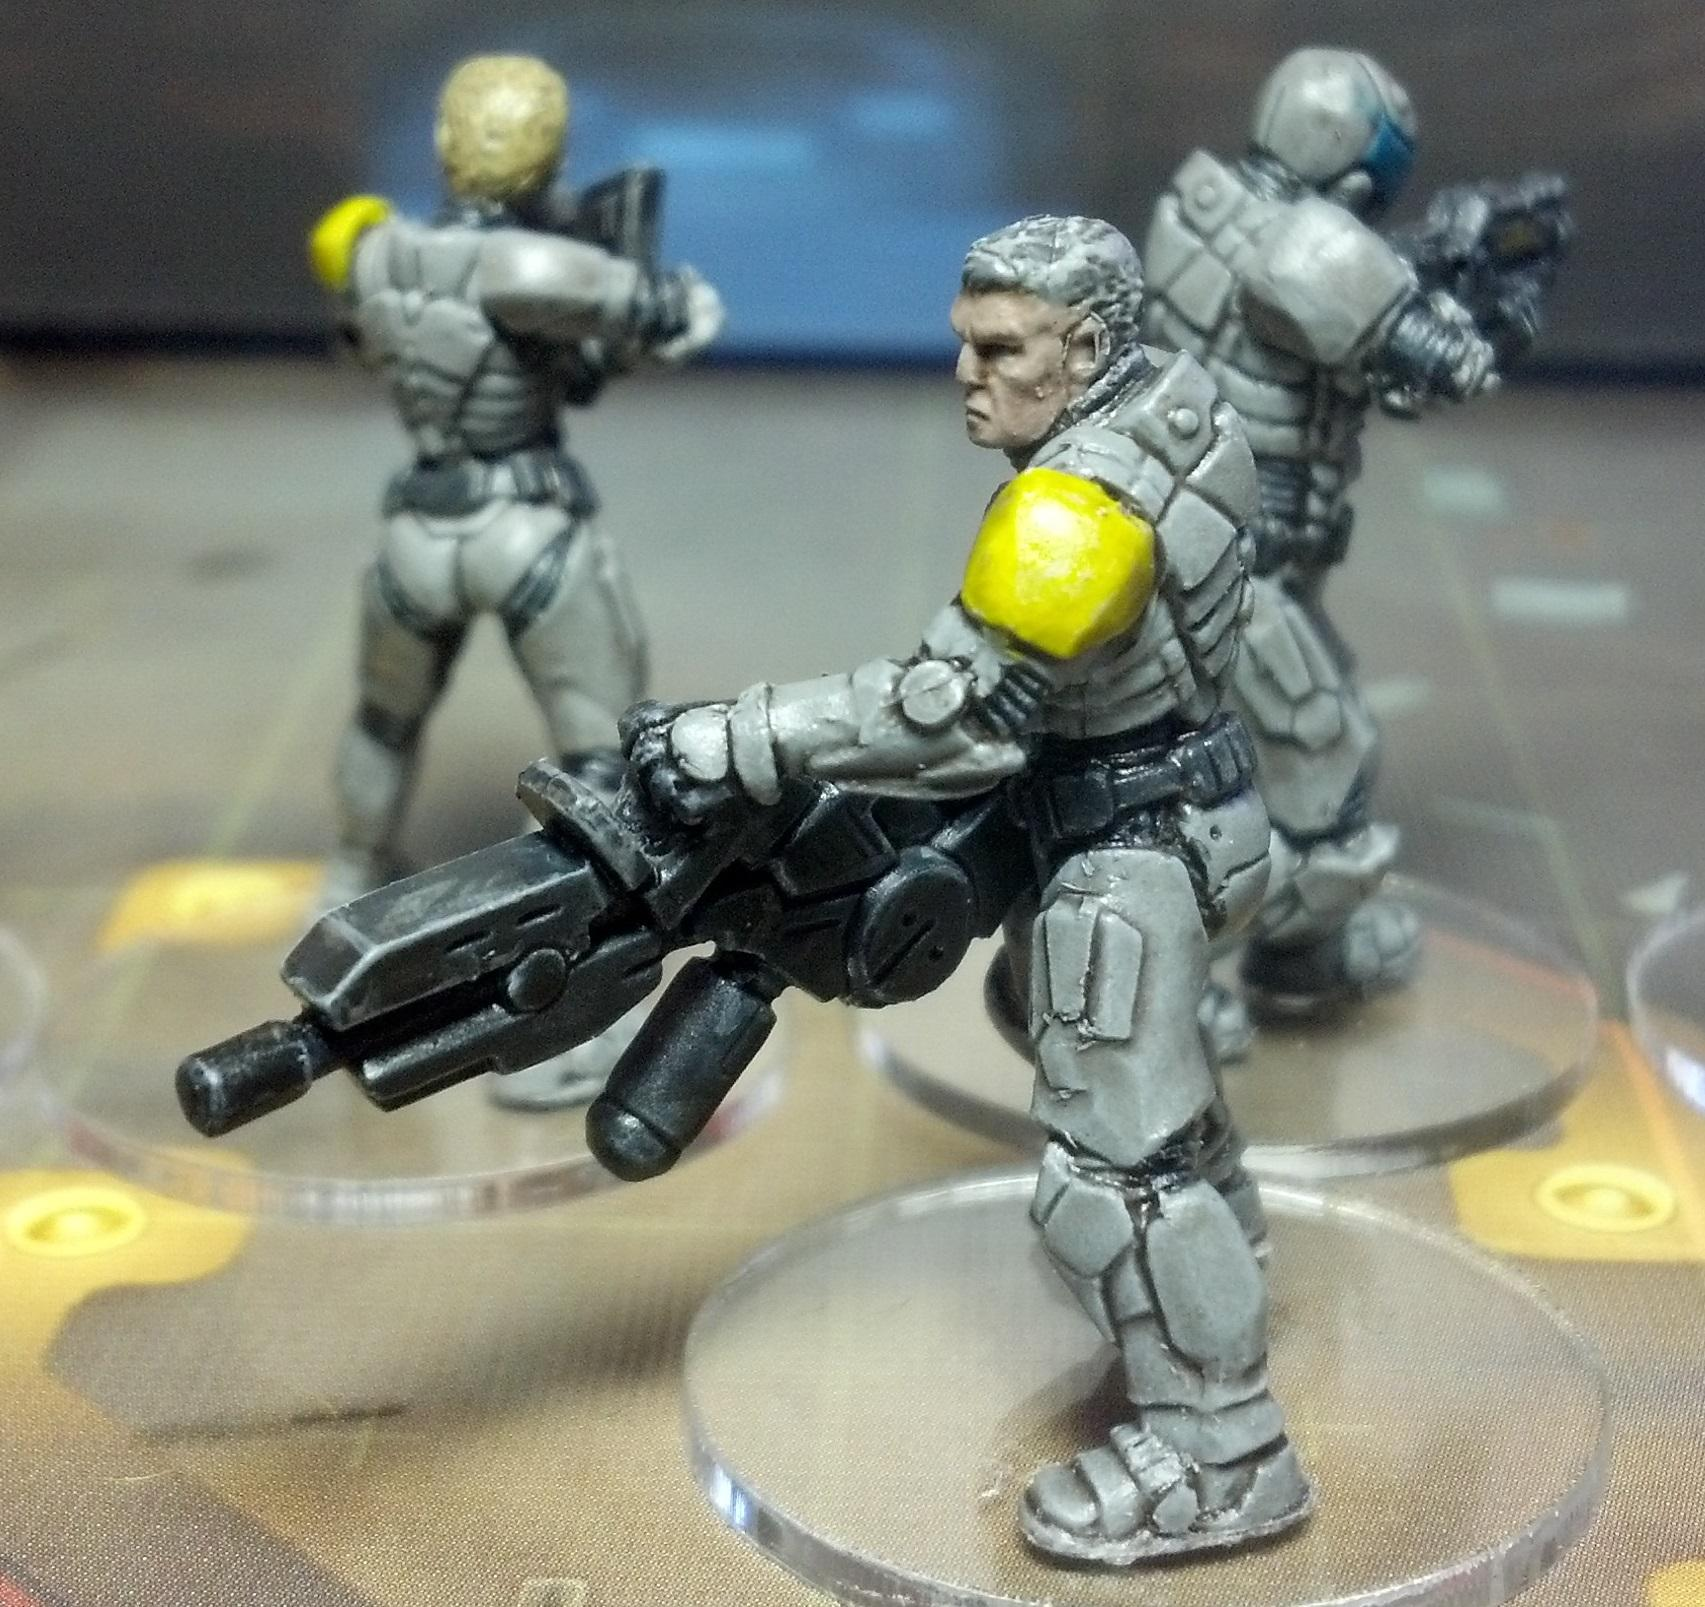 Dipped, Scifi, Sedition Wars, Strain, Vanguard, Zombie